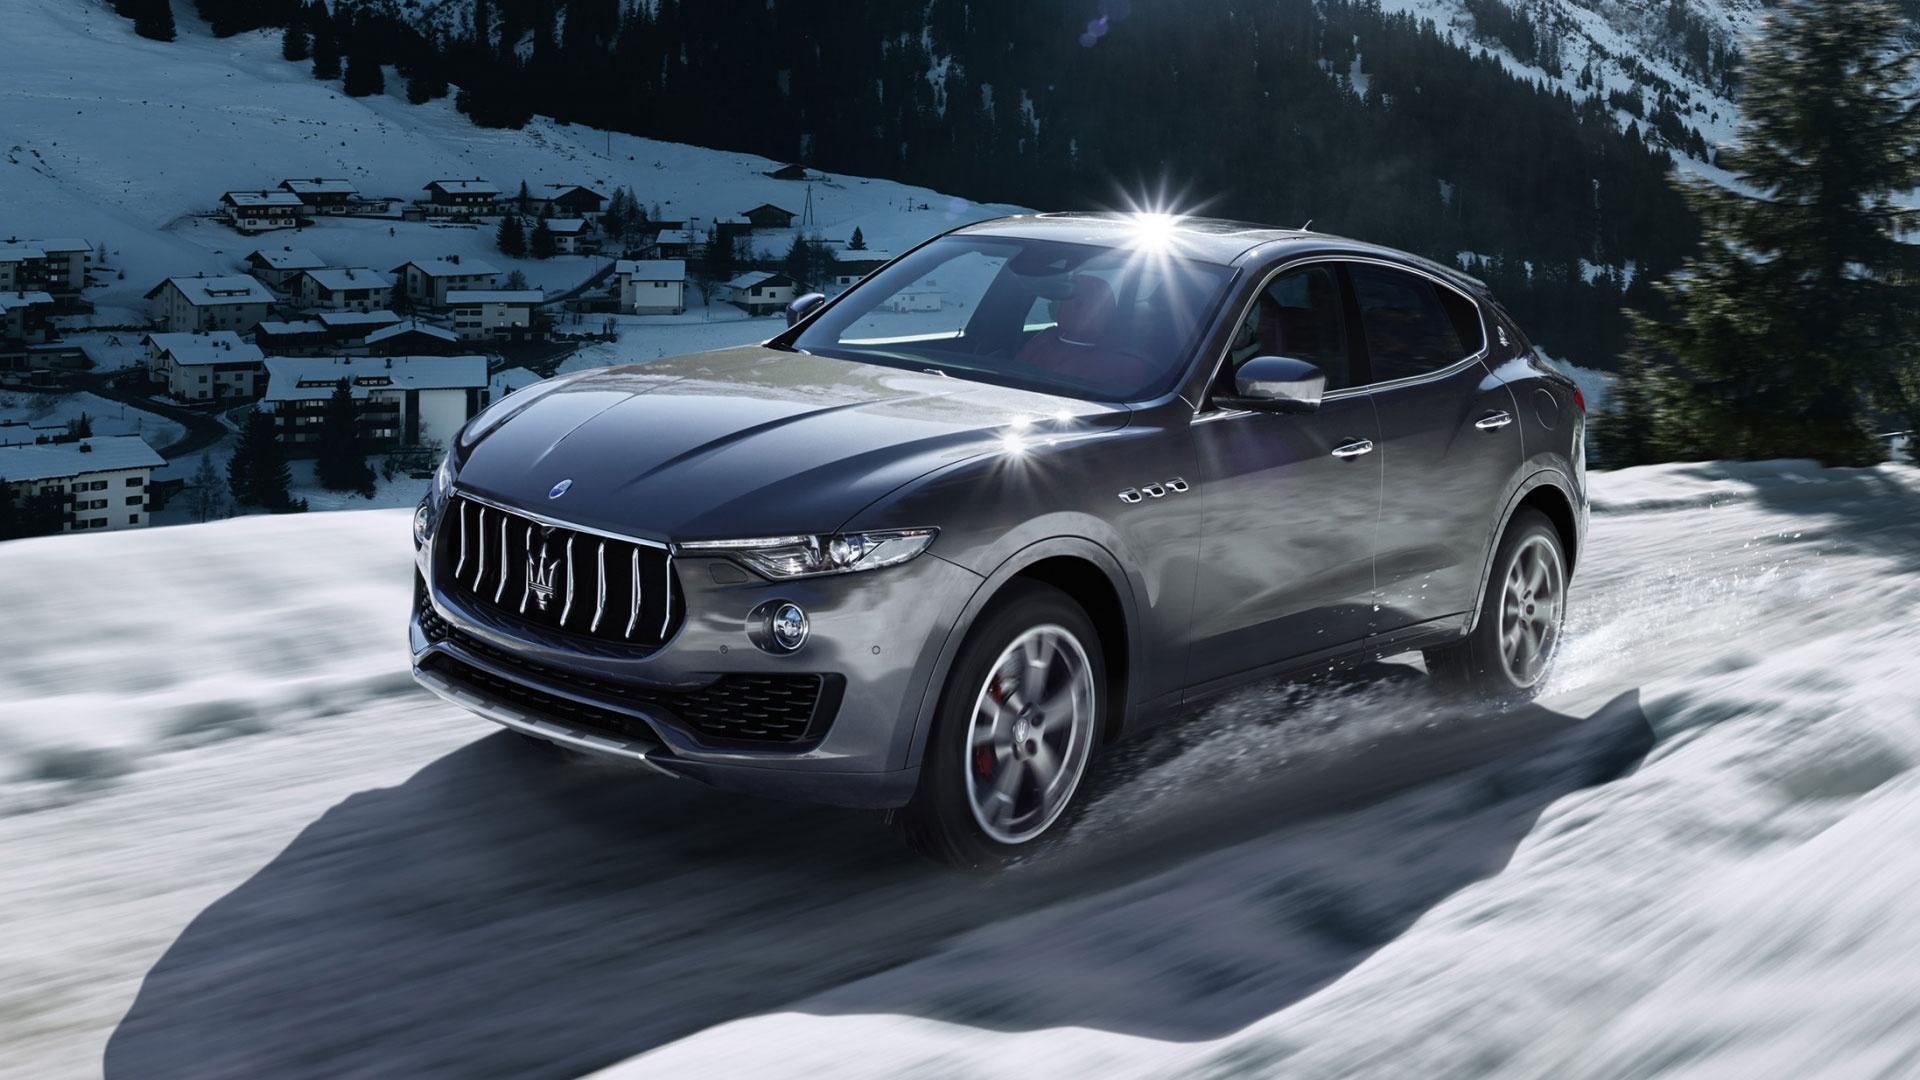 2017 Driver's Choice Awards & 2017 Maserati Levante